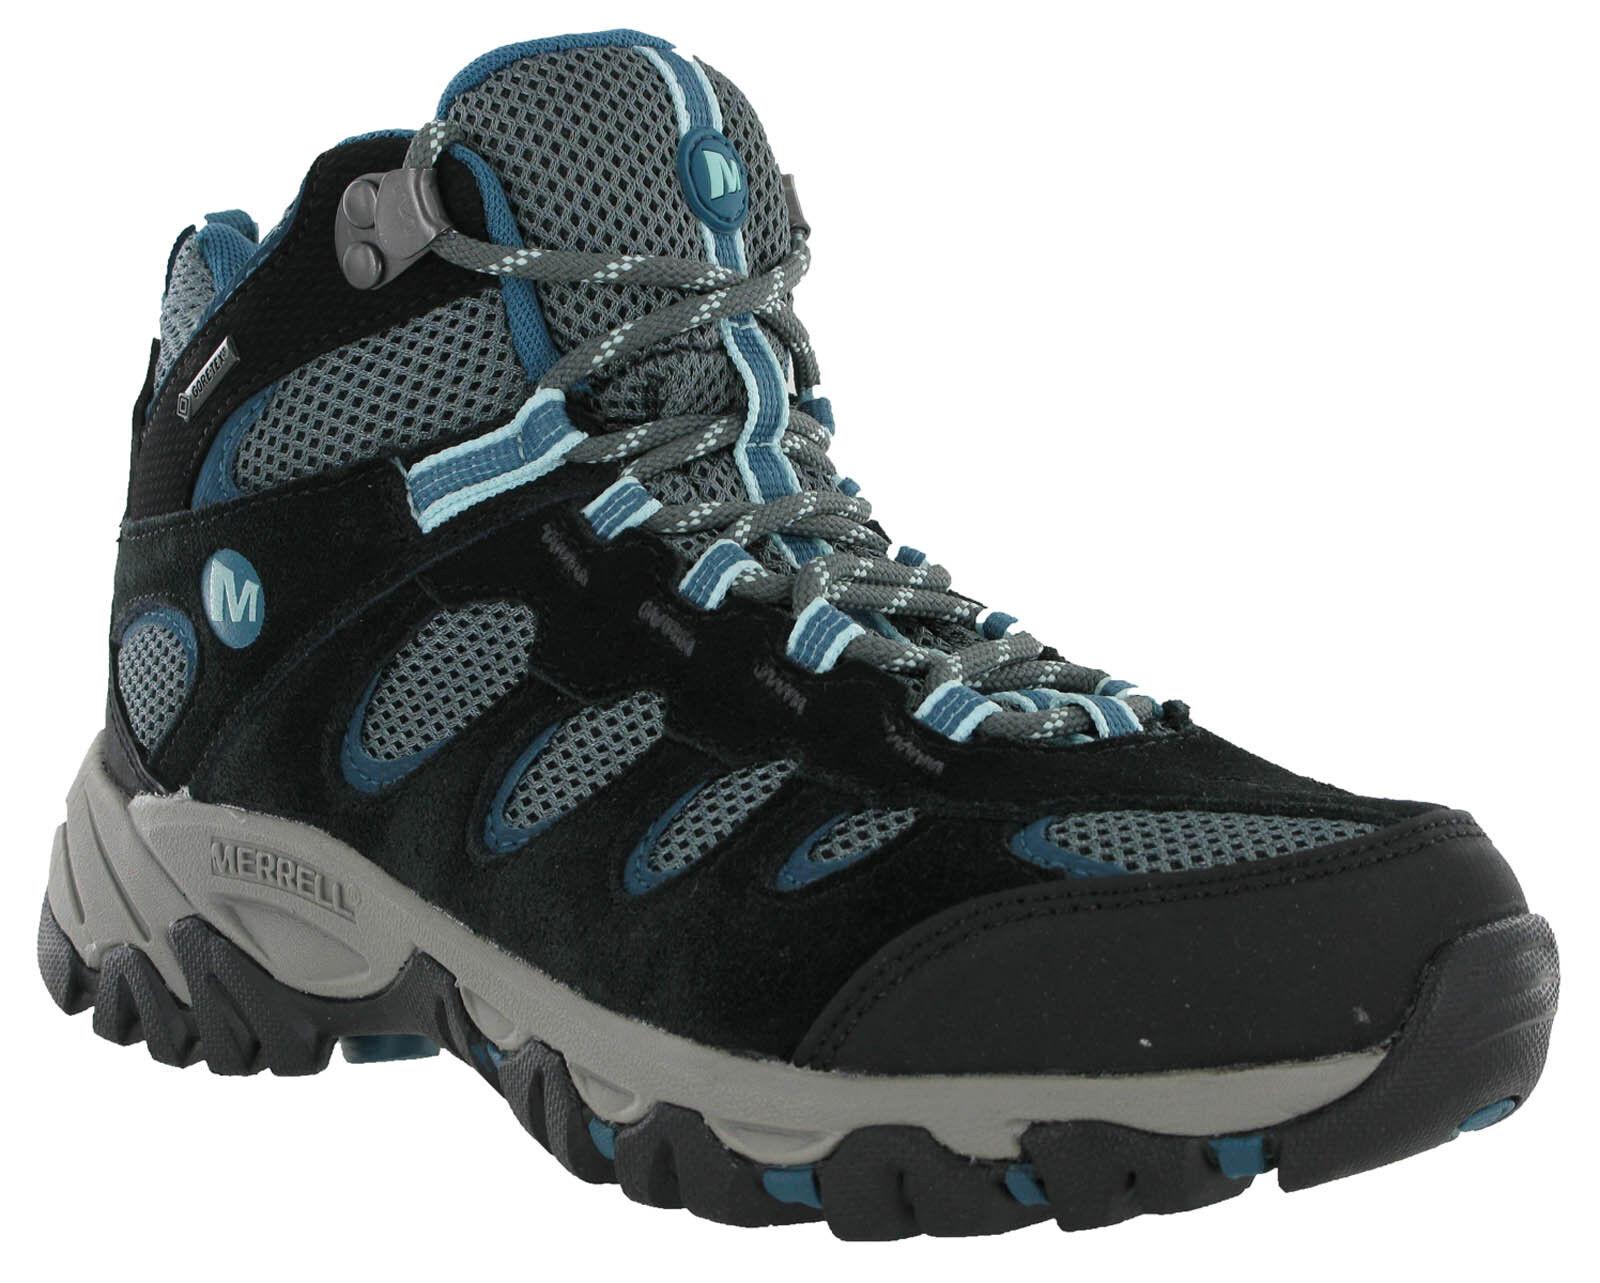 Merrell Ridgepass Mid Zapatos de High Rise Senderismo Mujer